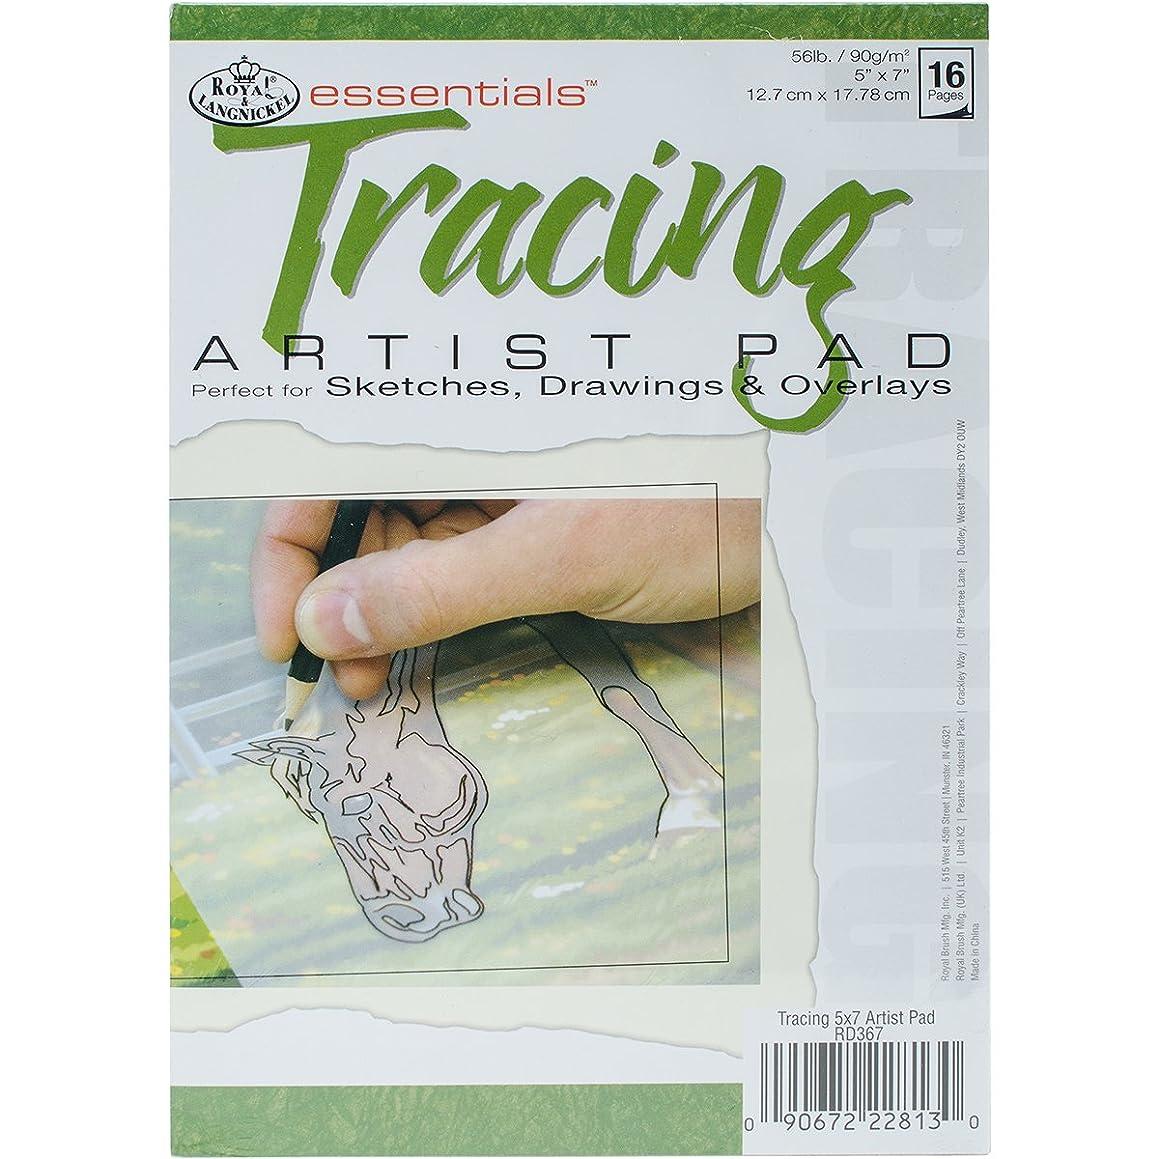 Royal Brush (ROYH8) Essentials(TM) Tracing Artist Paper Pad 5